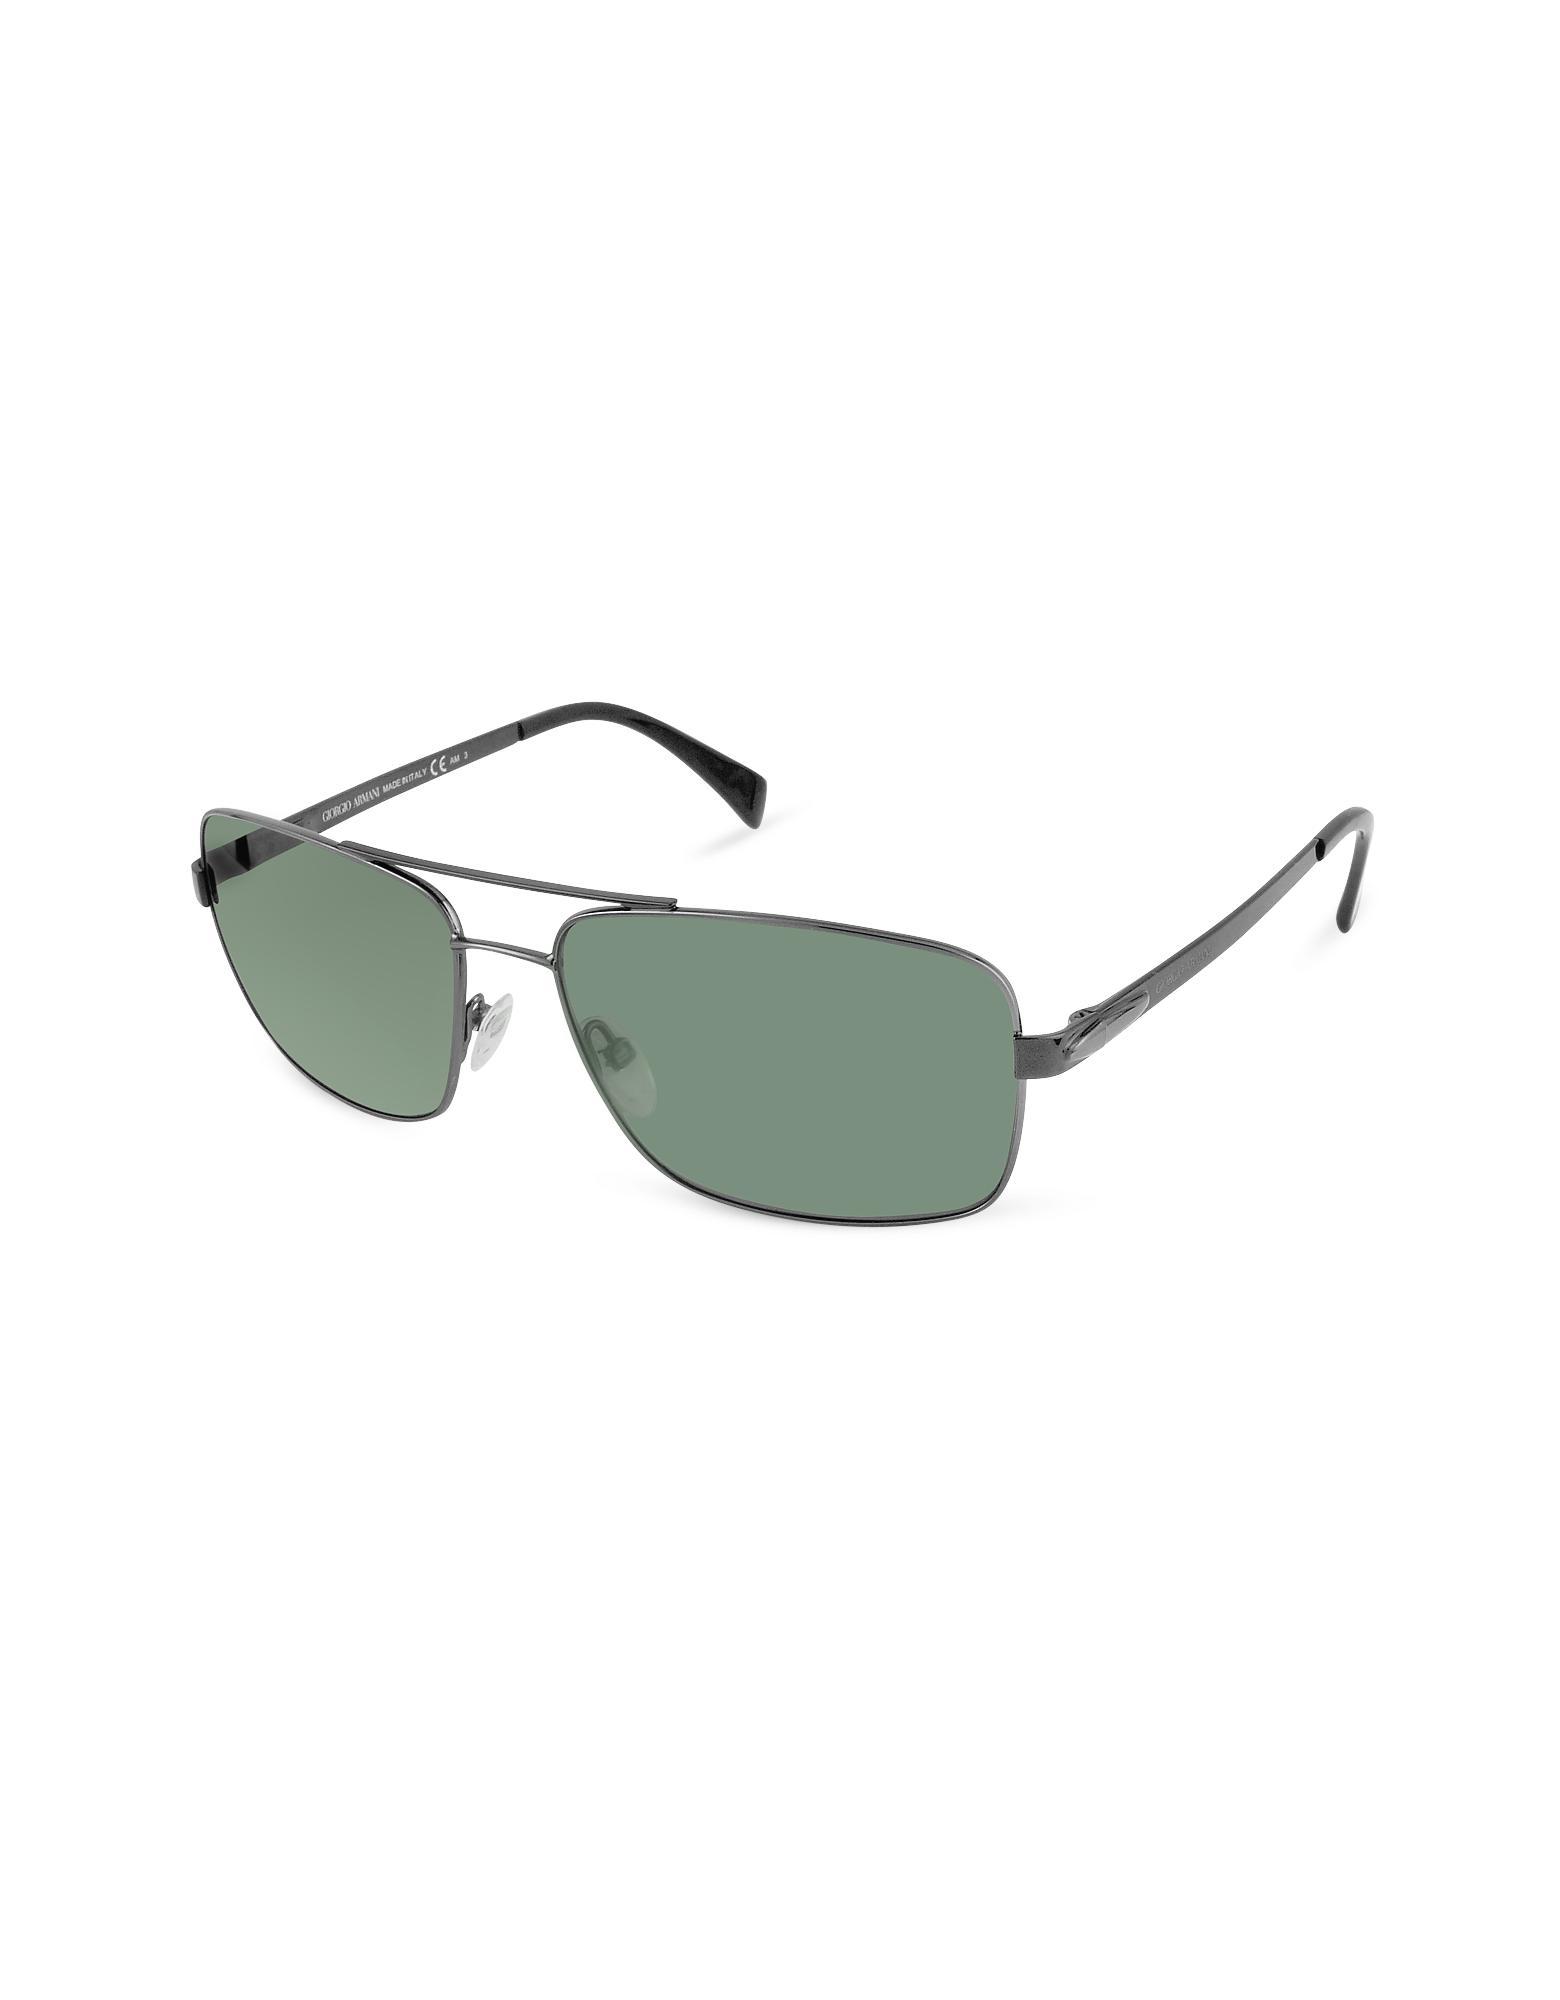 Giorgio Armani Metal Sunglasses